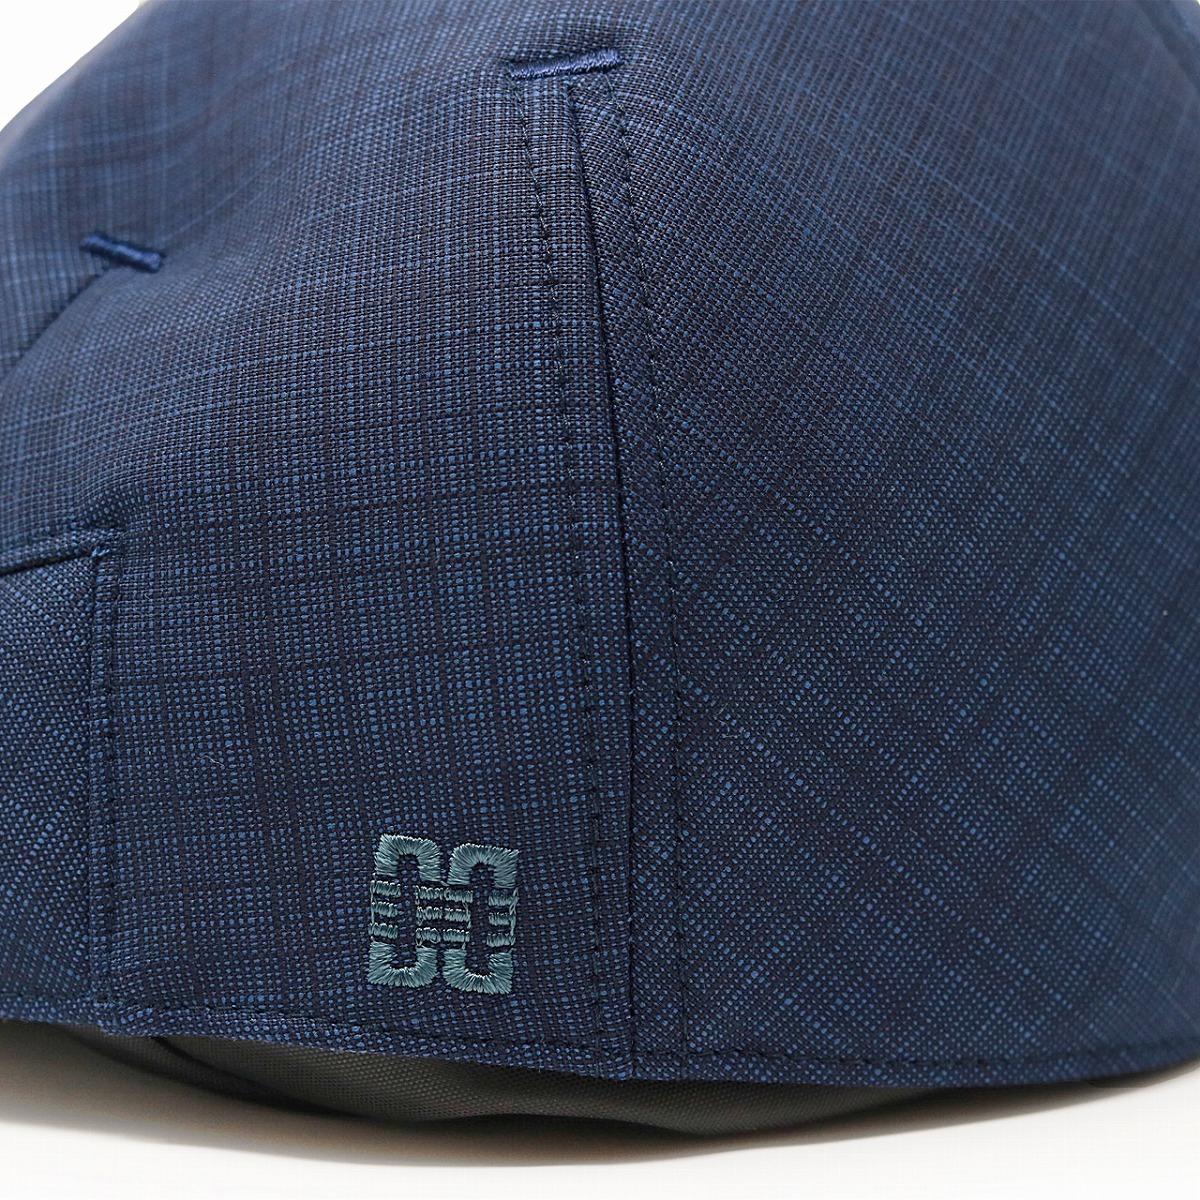 29d2e073f96 It is a gift present in natural fiber Shin pull plain fabric daks hunting cap  hat gentleman big size S M L LL hunting cap hat unisex Monaco hunting cap  ...